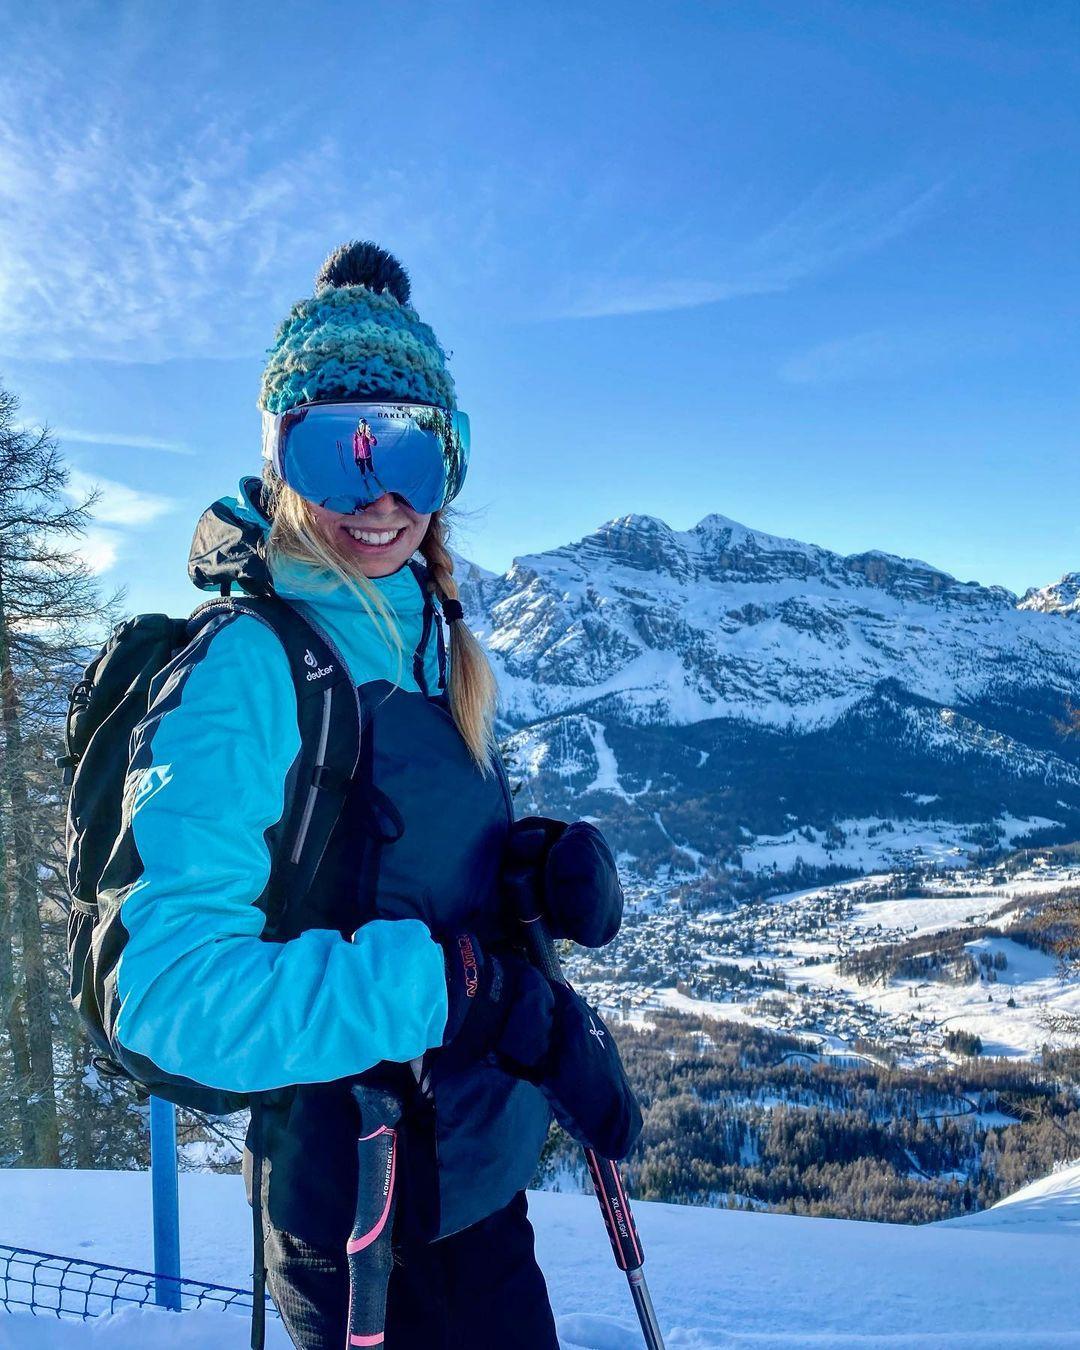 Cortina d'Ampezzowisata terbaik musim salju